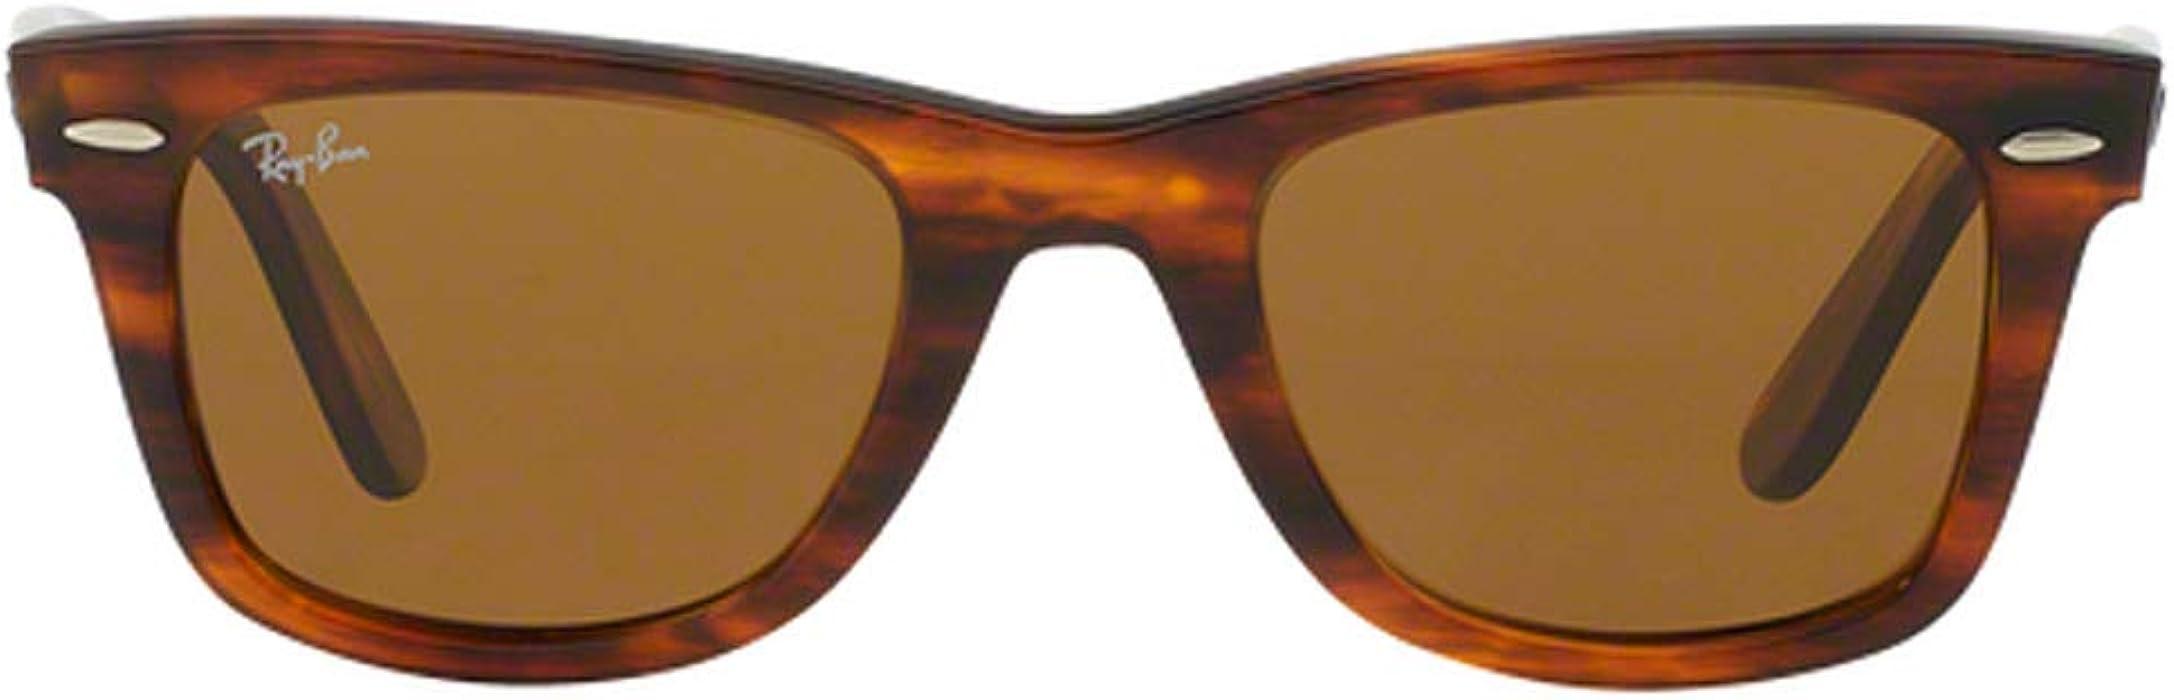 3b74164687316 Ray-Ban RB2140 Original Wayfarer Unisex Sunglasses (Tortoise Frame Brown  Lens 954